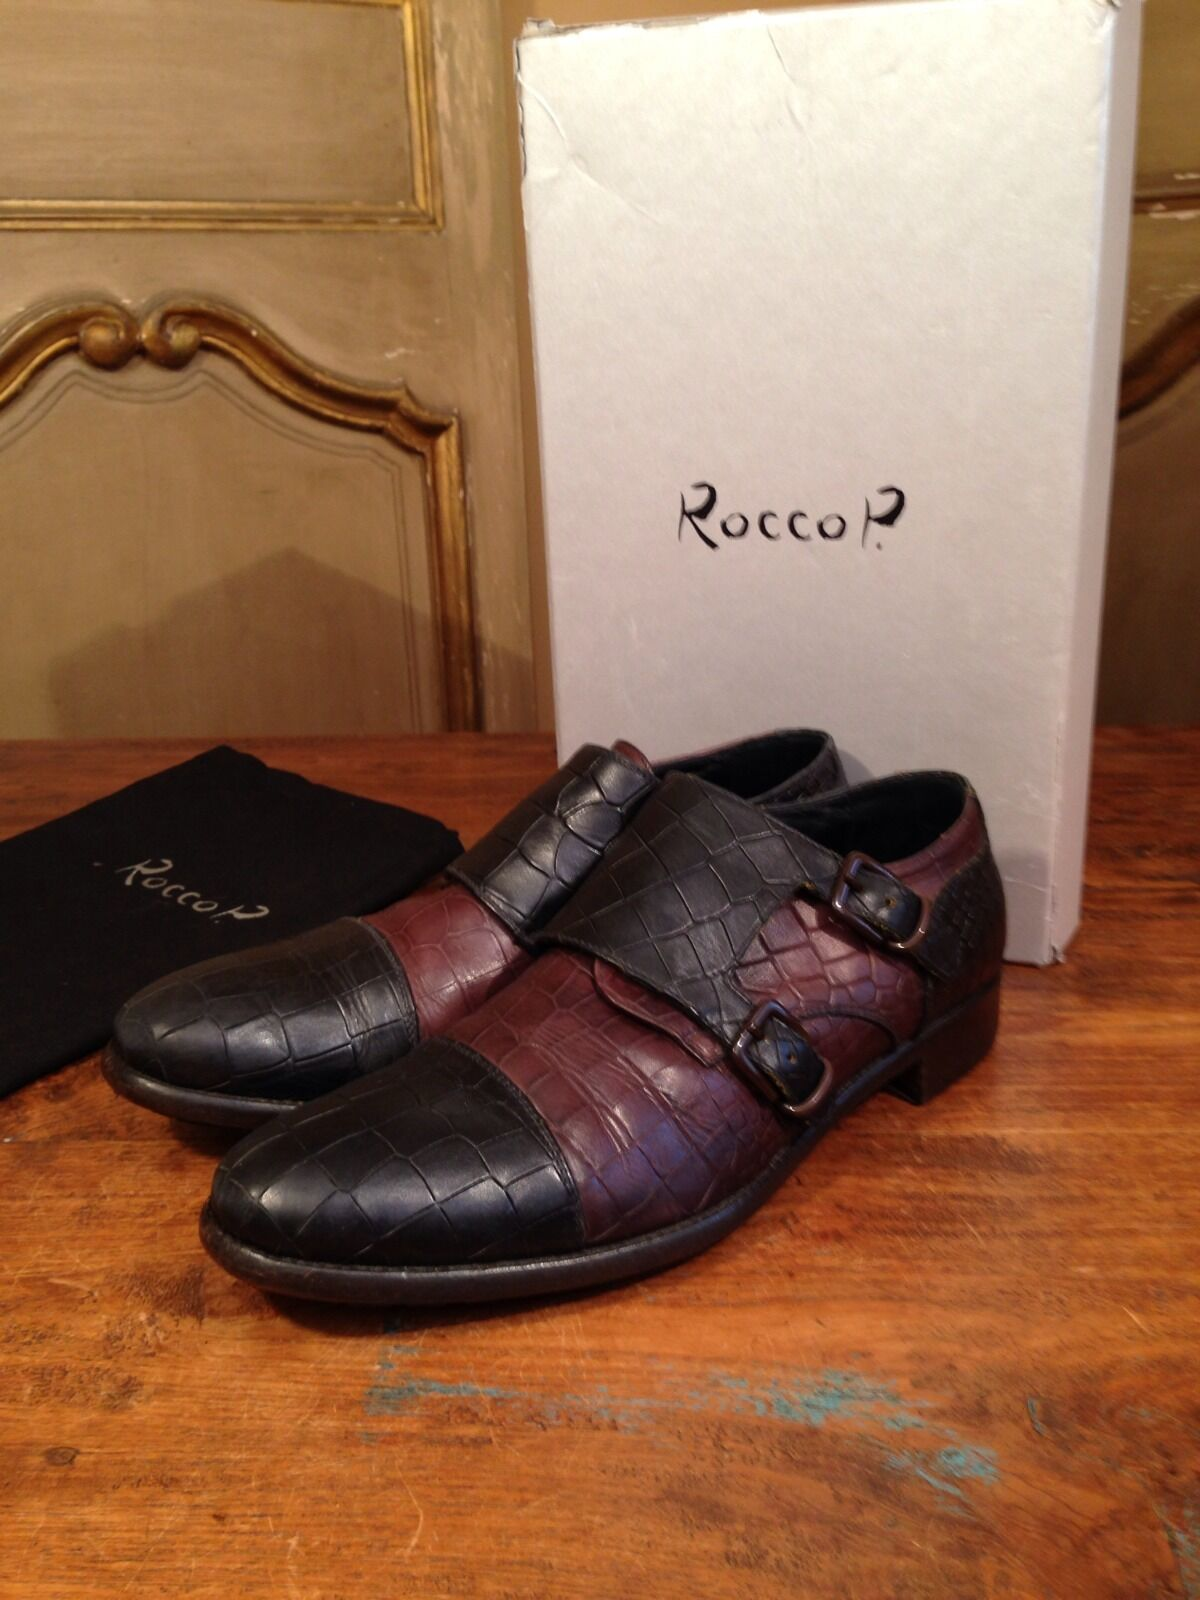 Rocco P Women's Side Buckle Crocodile Boots shoes Size Size Size 6.5 Euro 37 Enjoy 98e9a7